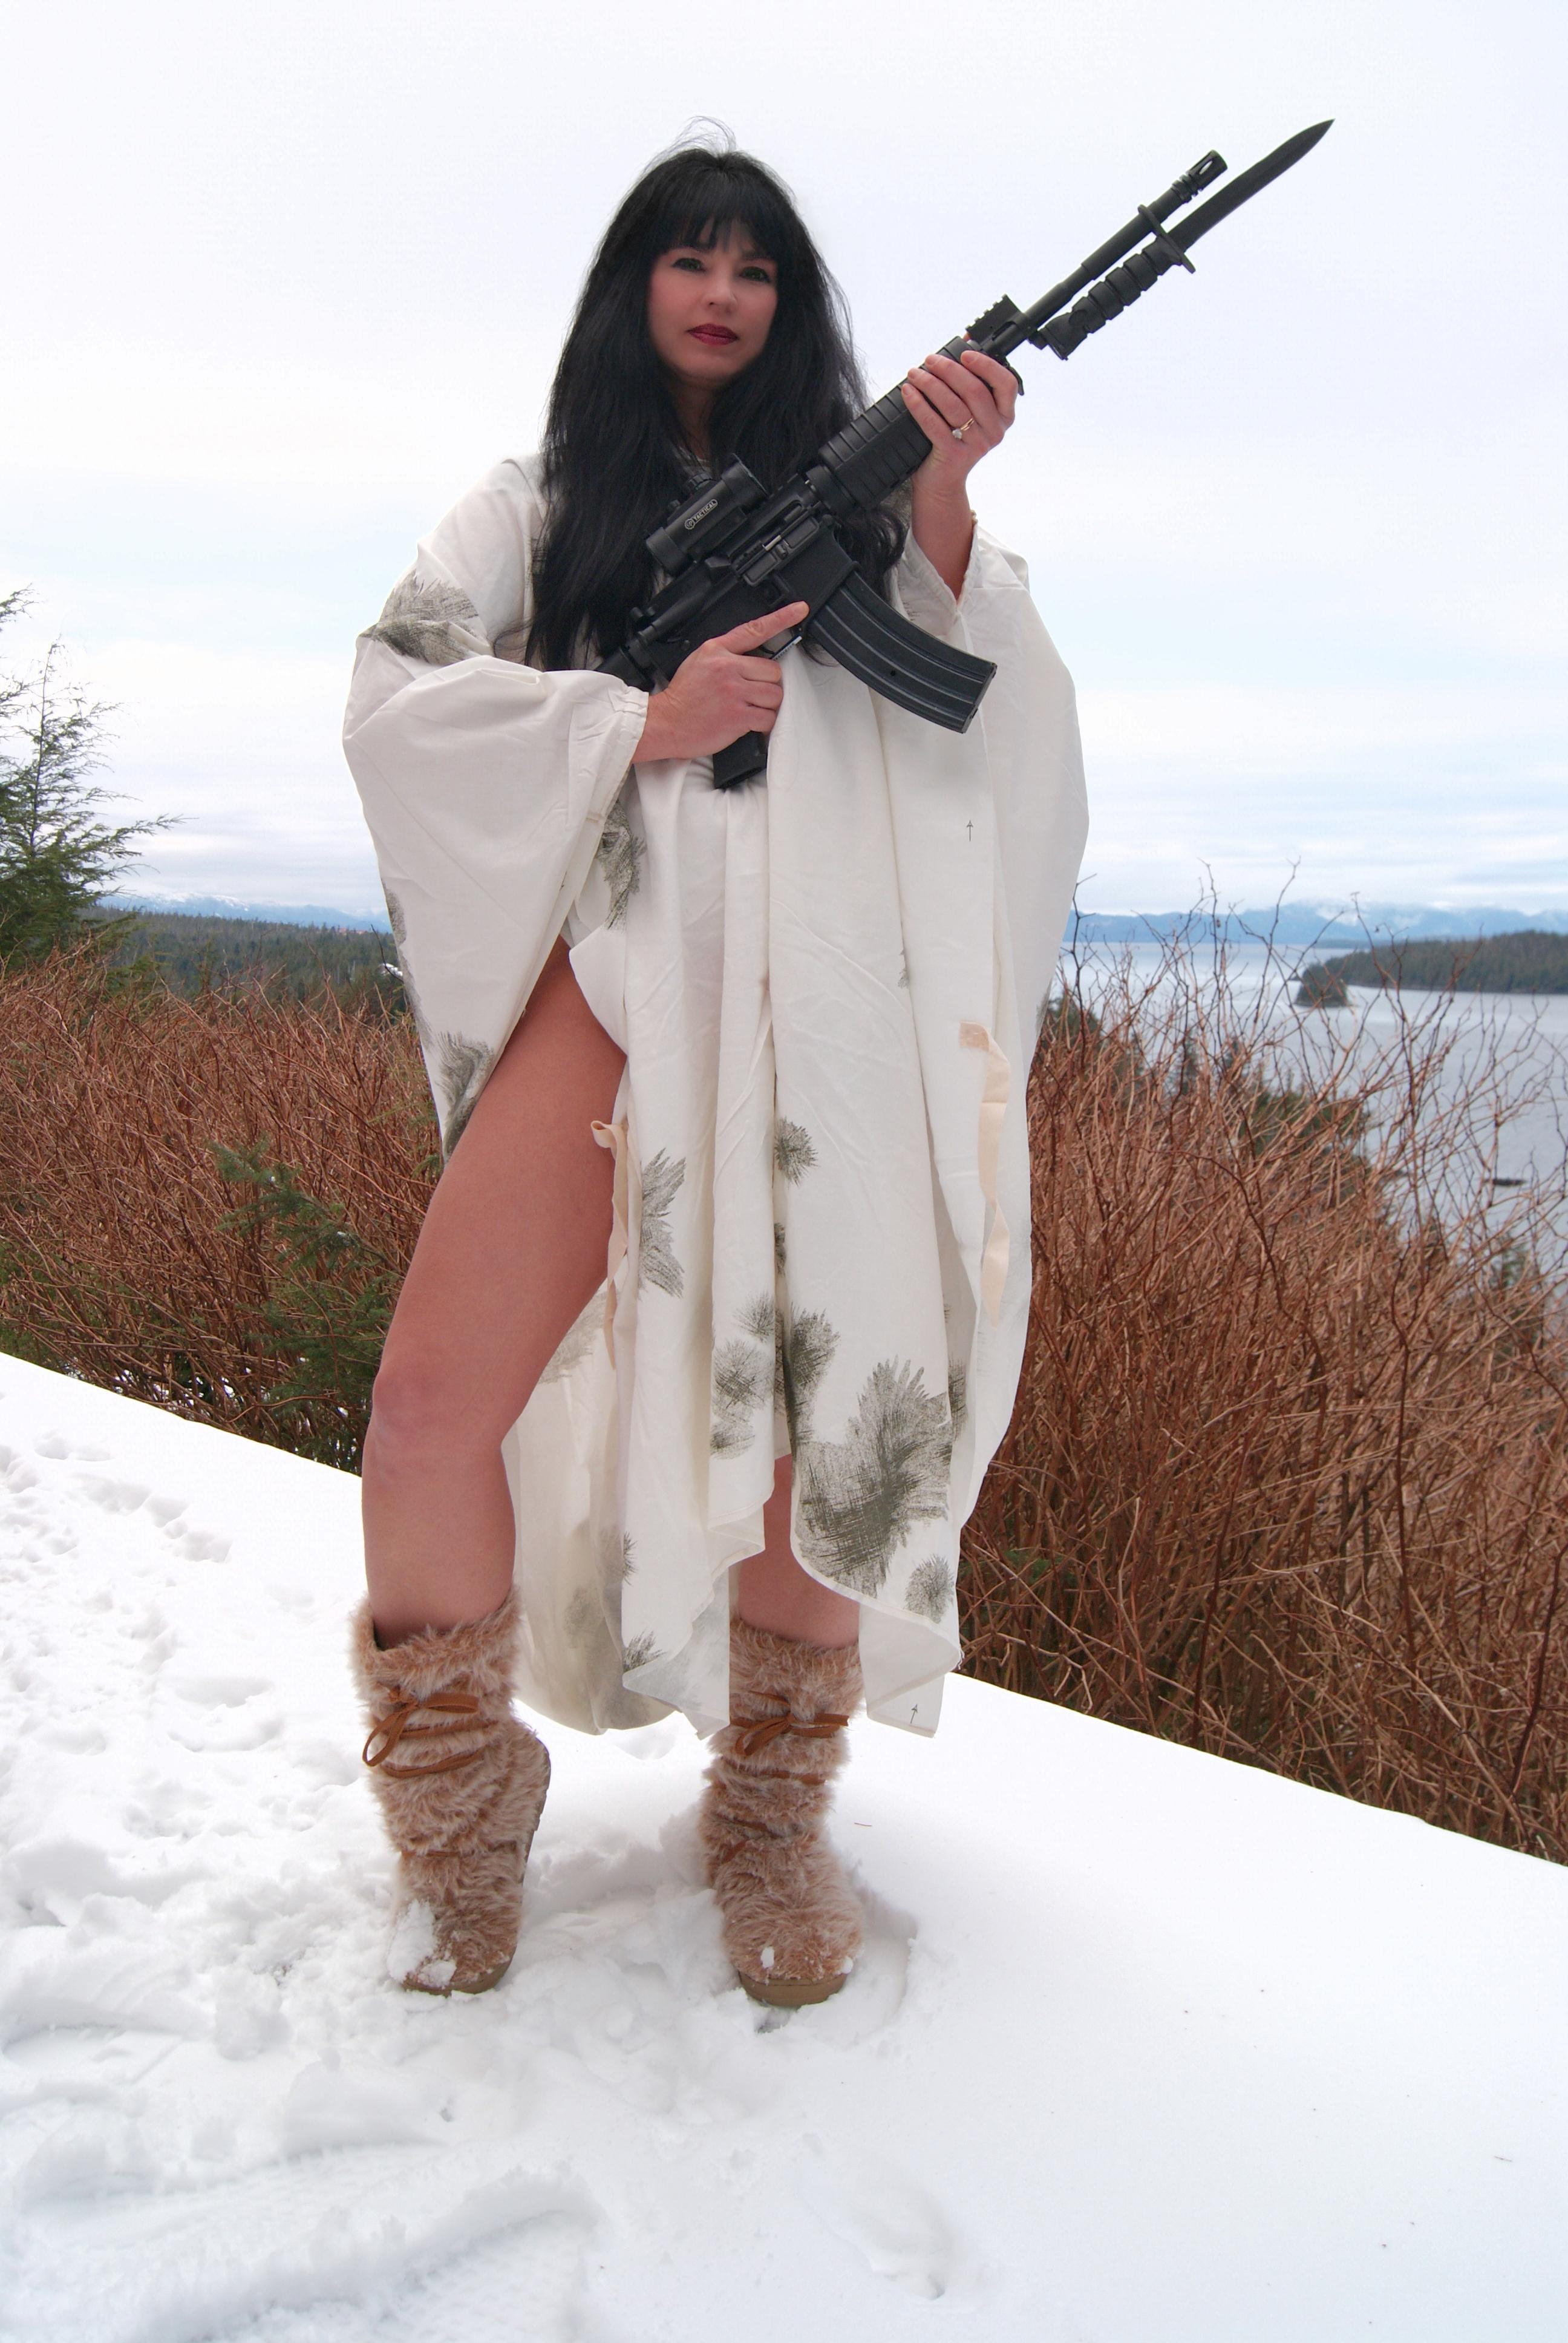 Alaskan Prepper Girl-lisagun.jpg